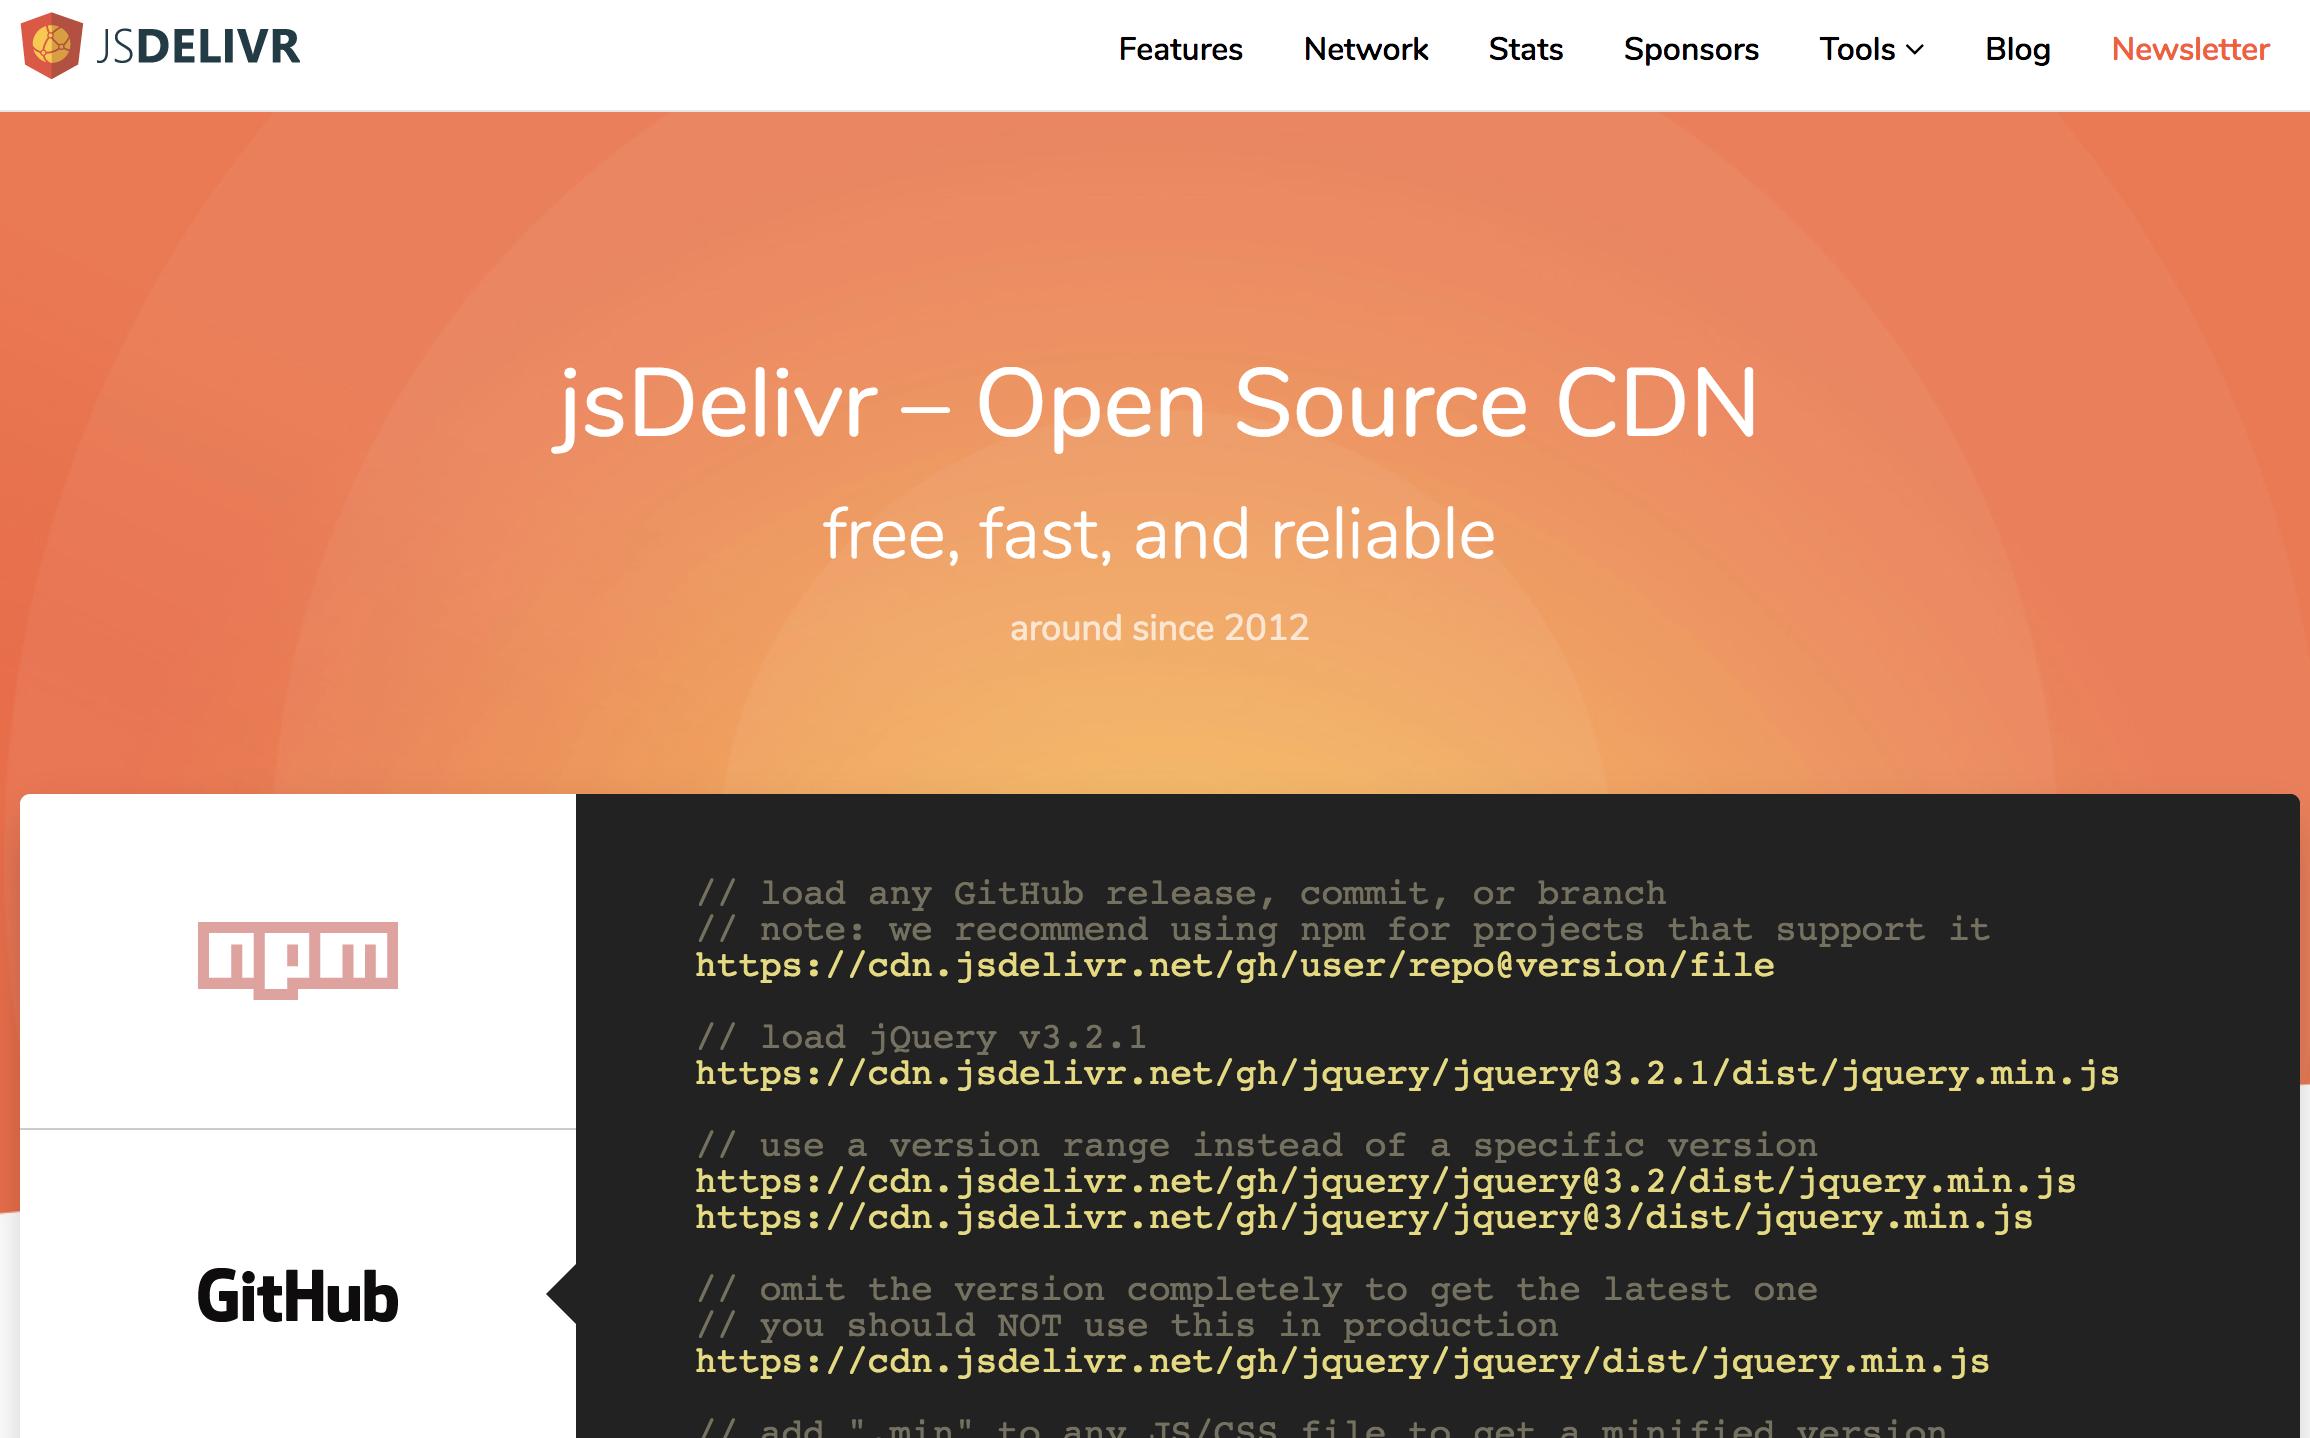 《jsDelivr 为开发者提供免费公共 CDN 加速服务》